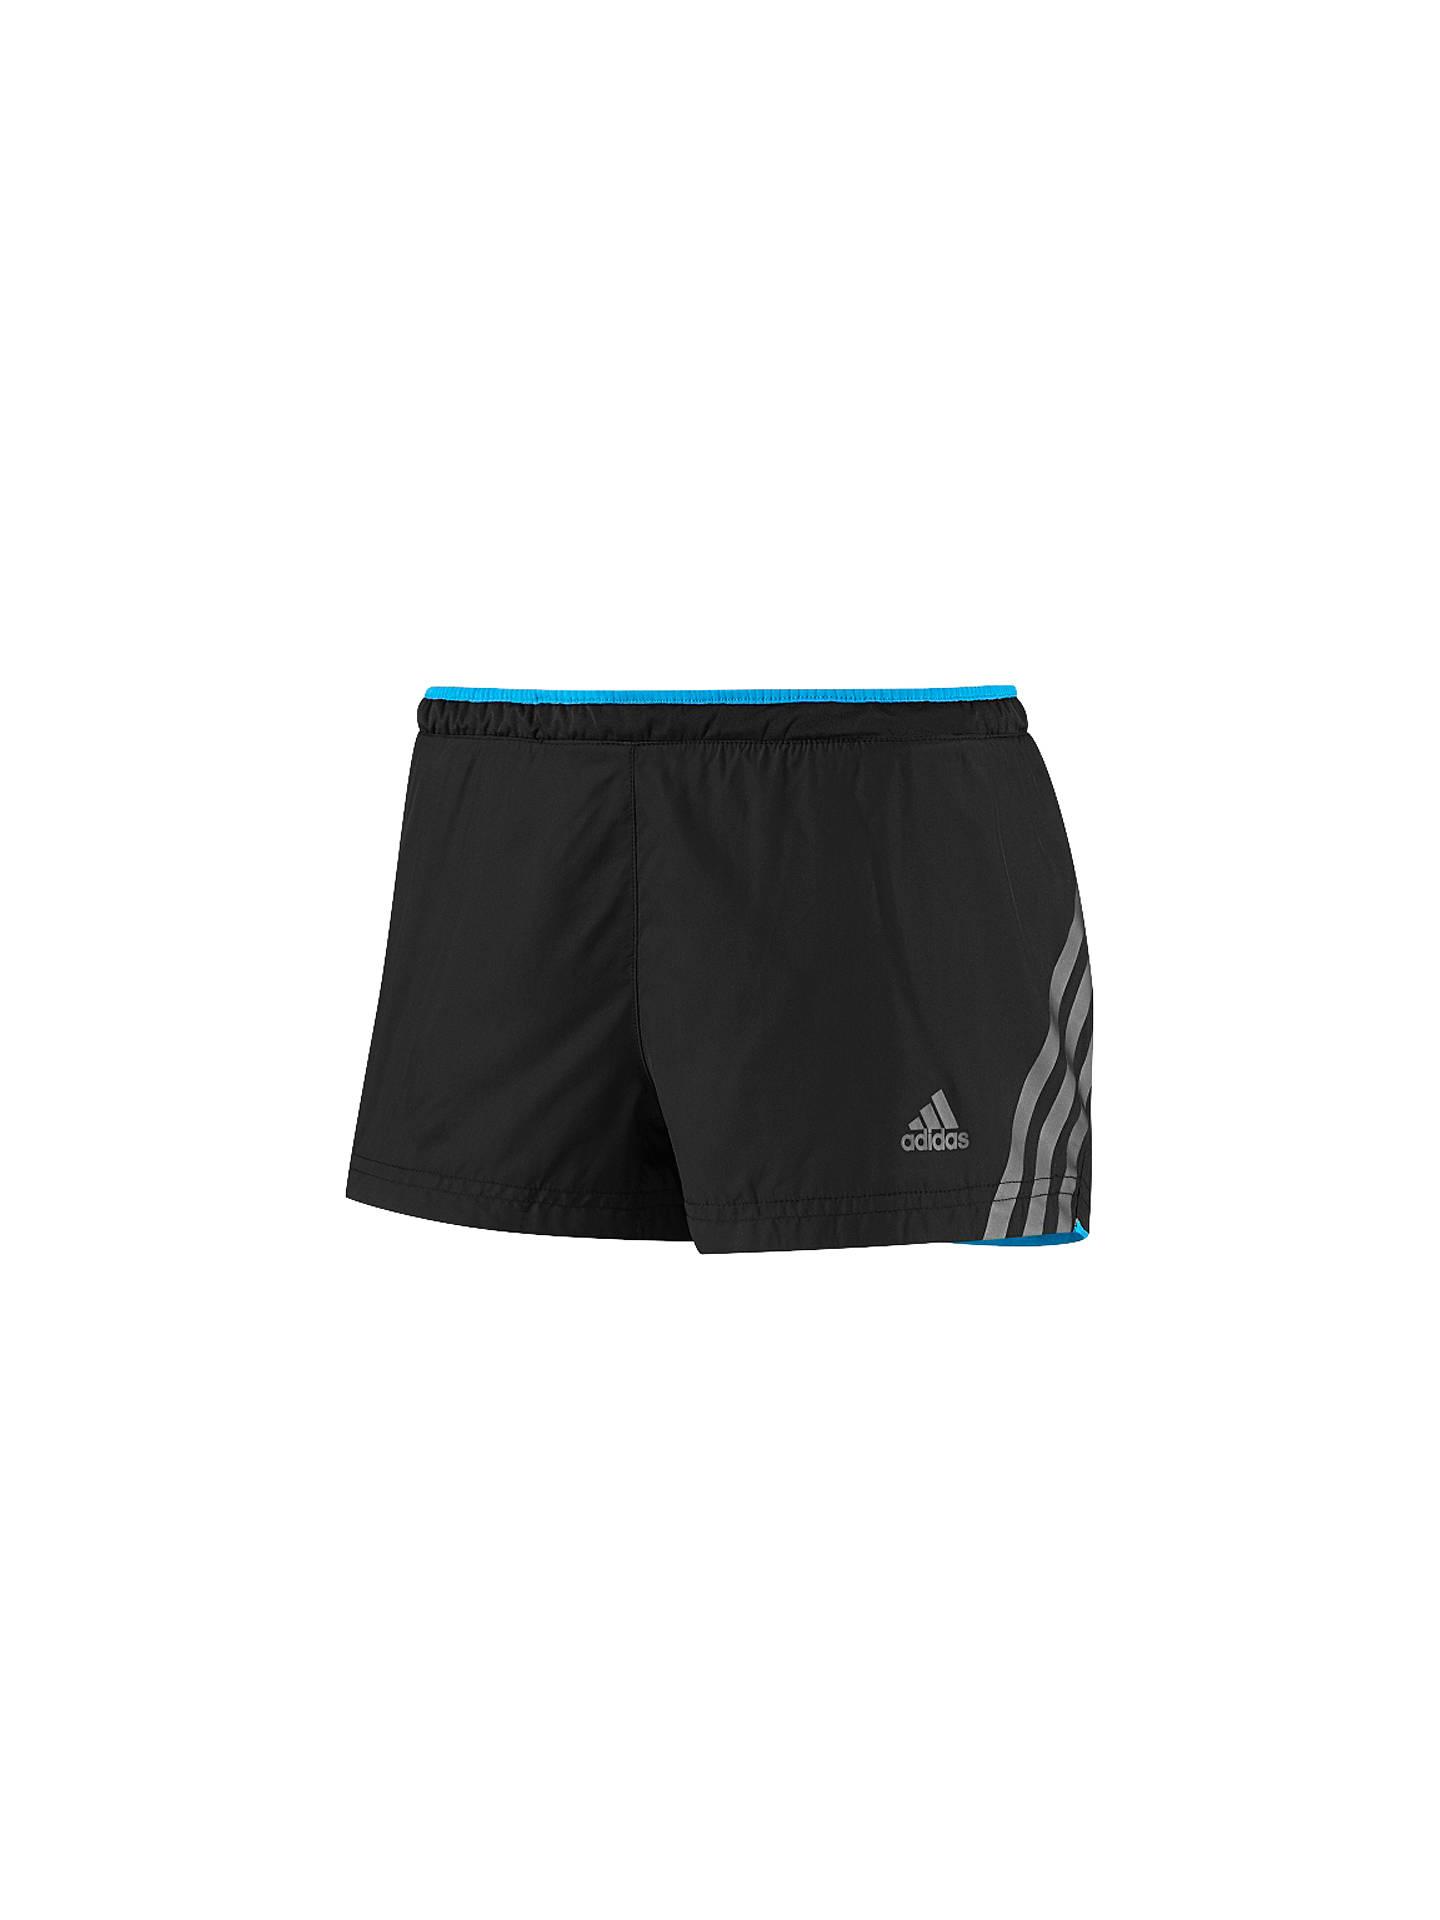 250cfbd148cdf Buy Adidas Women s Supernova Glide Shorts